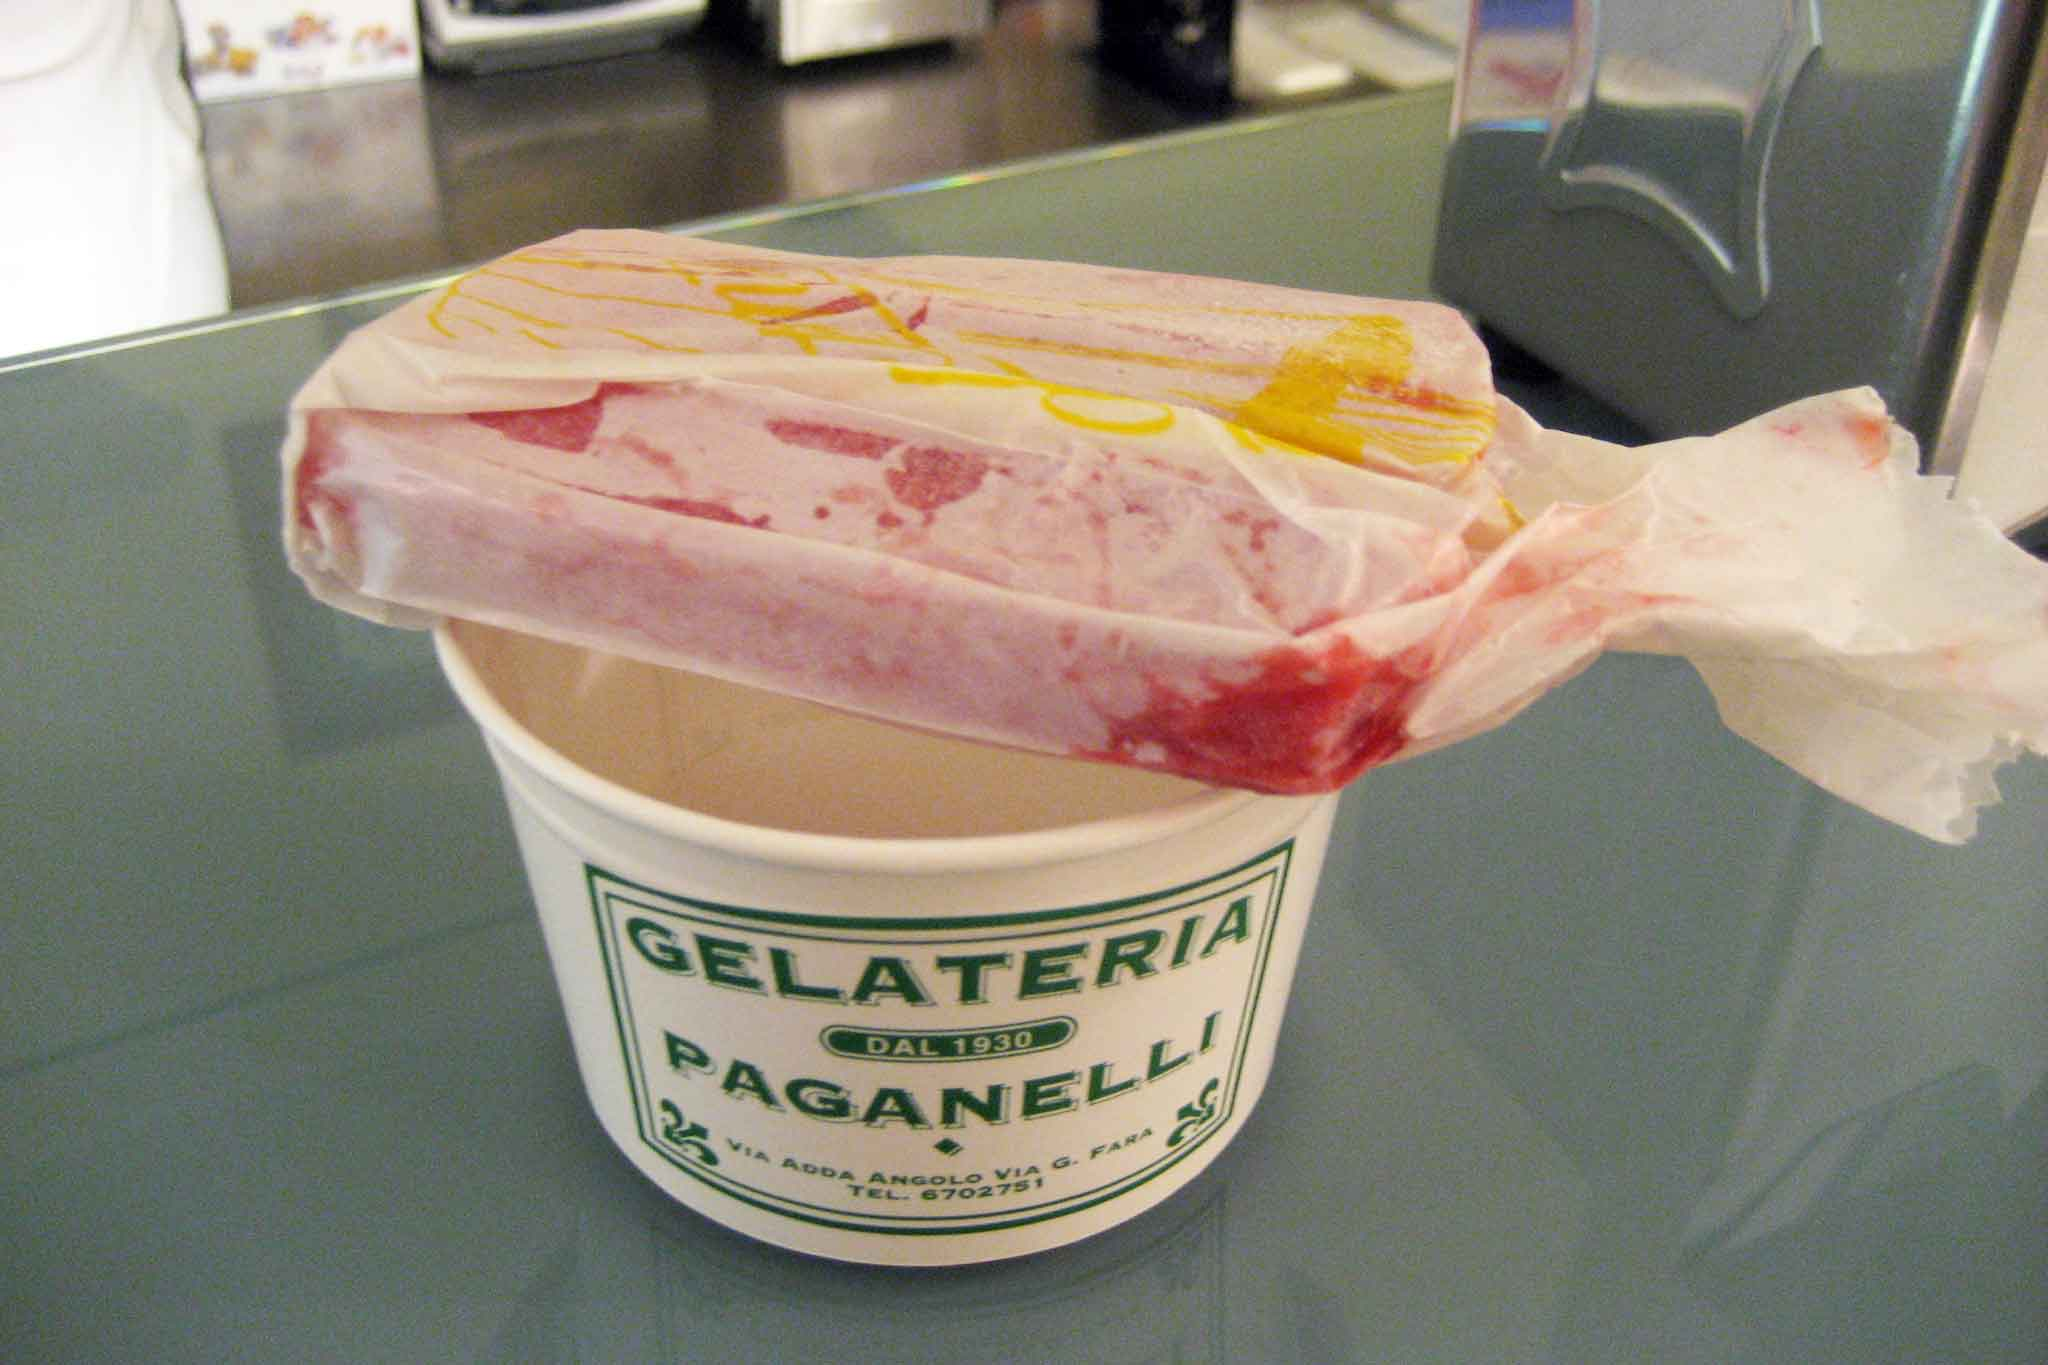 gelateria Paganelli